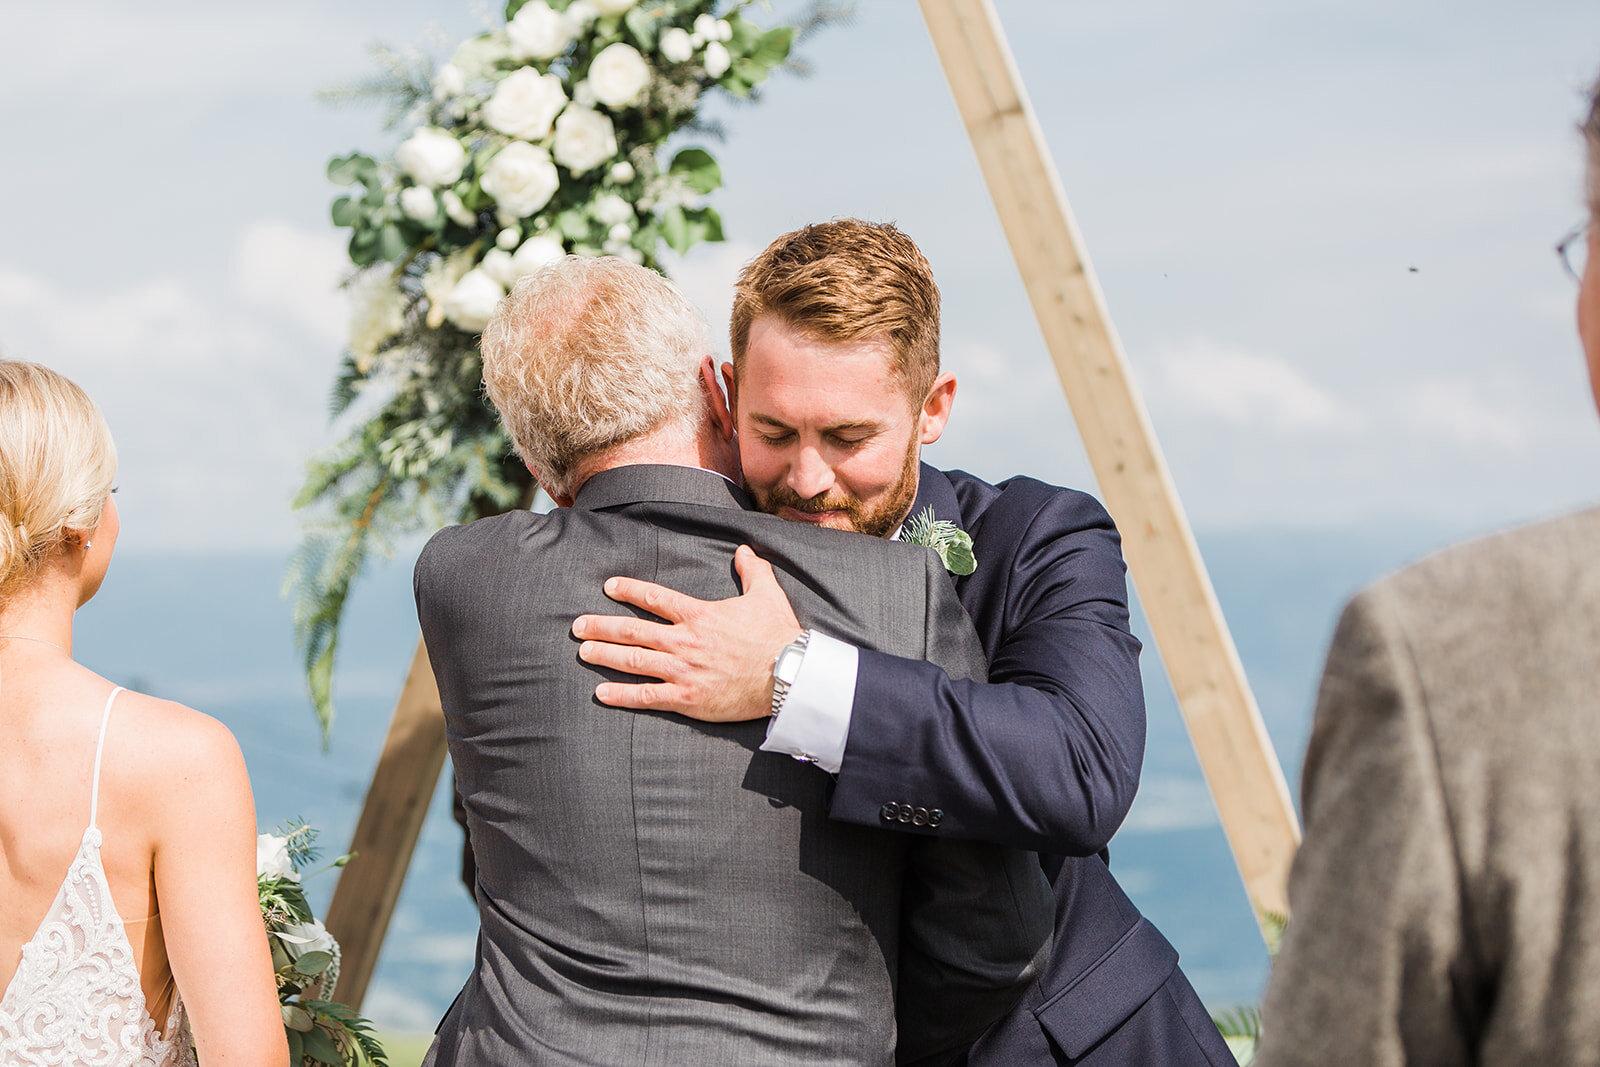 brides father and groom spokane wedding ceremony